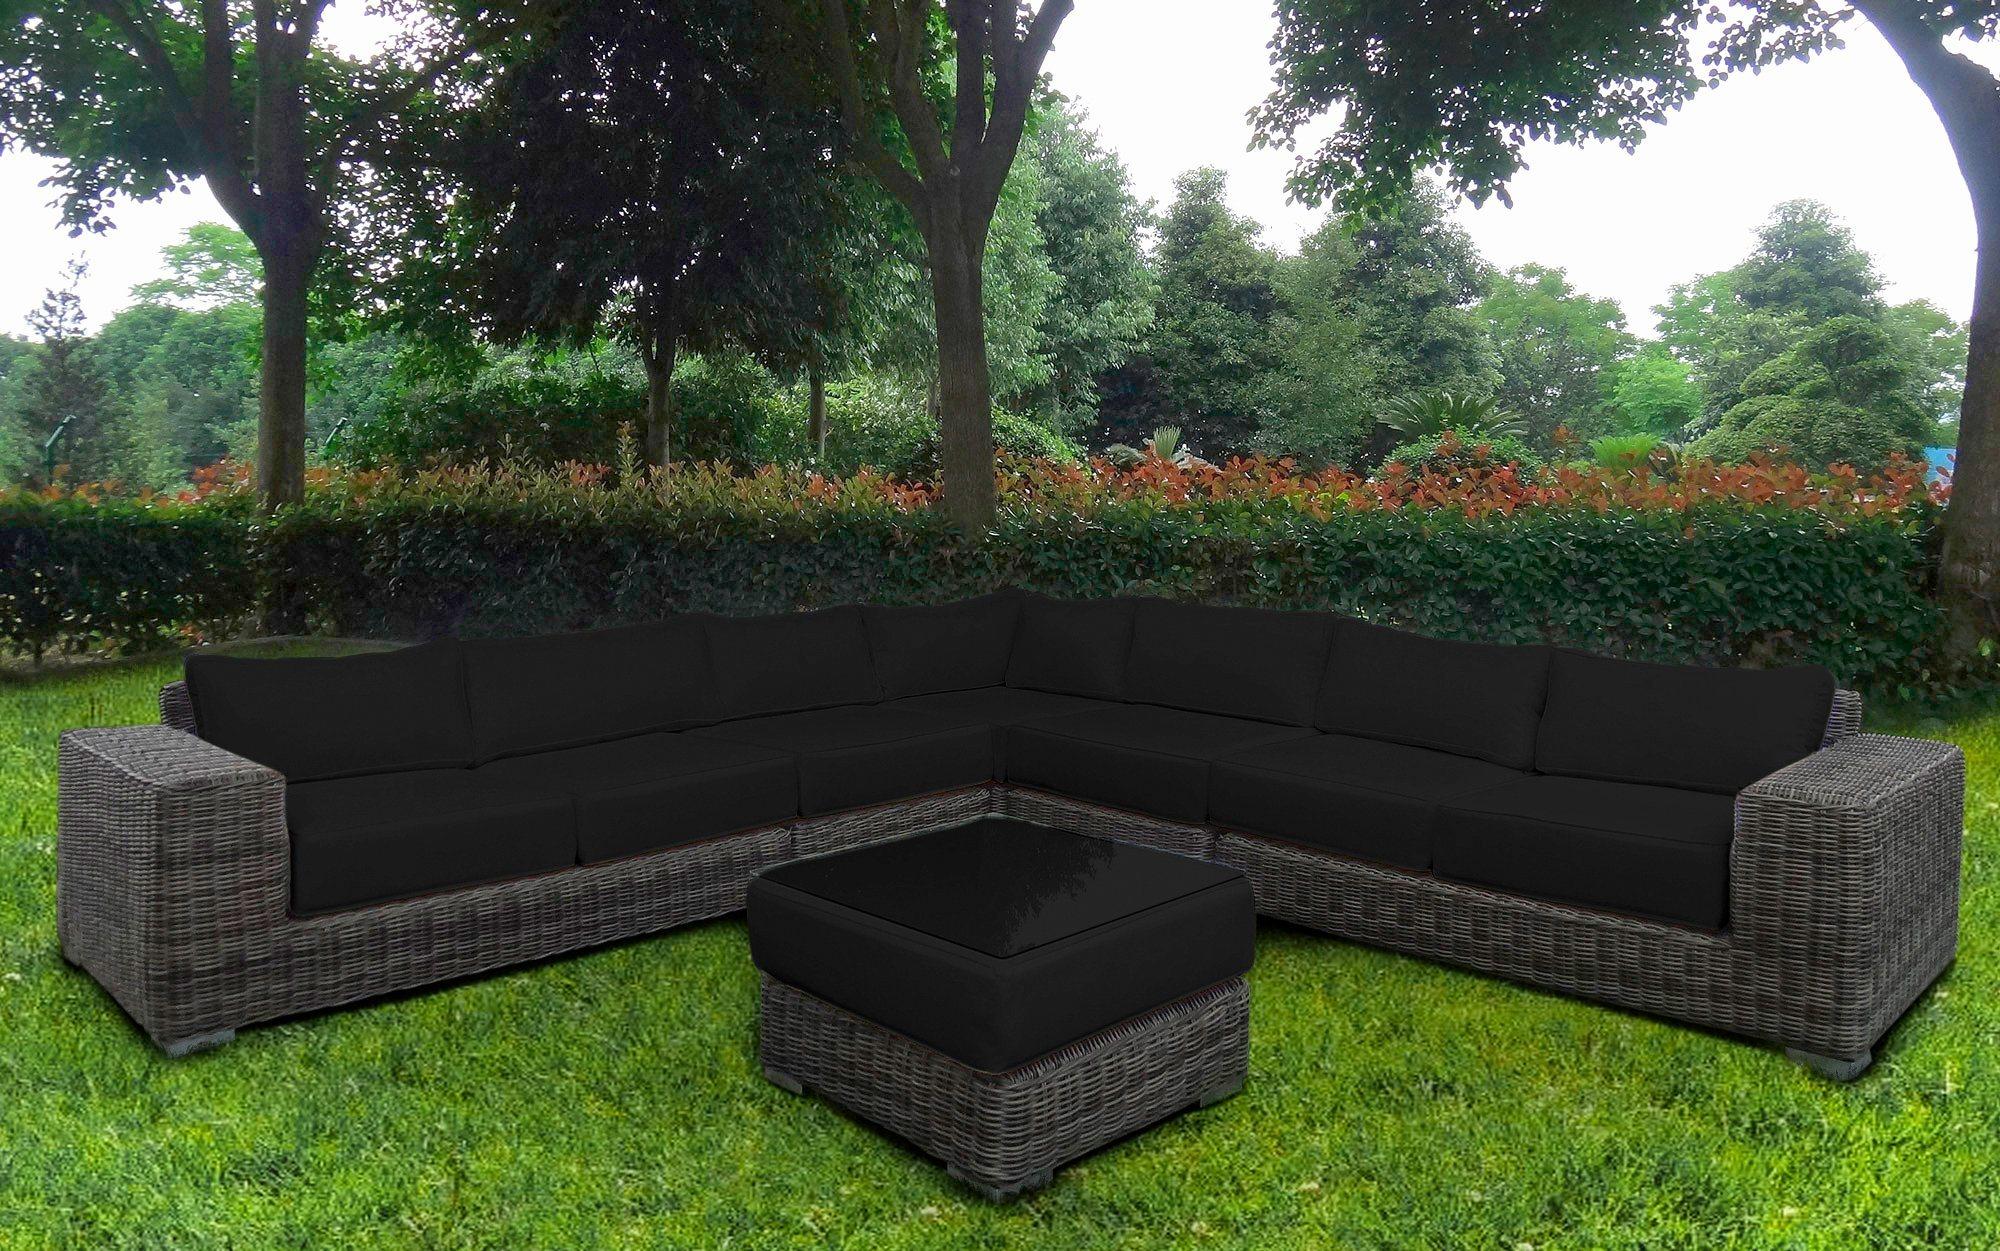 BAIDANI Loungeset »Sensation«, 21-tlg., Ecklounge, Tisch 67x67x40 cm, Polyrattan